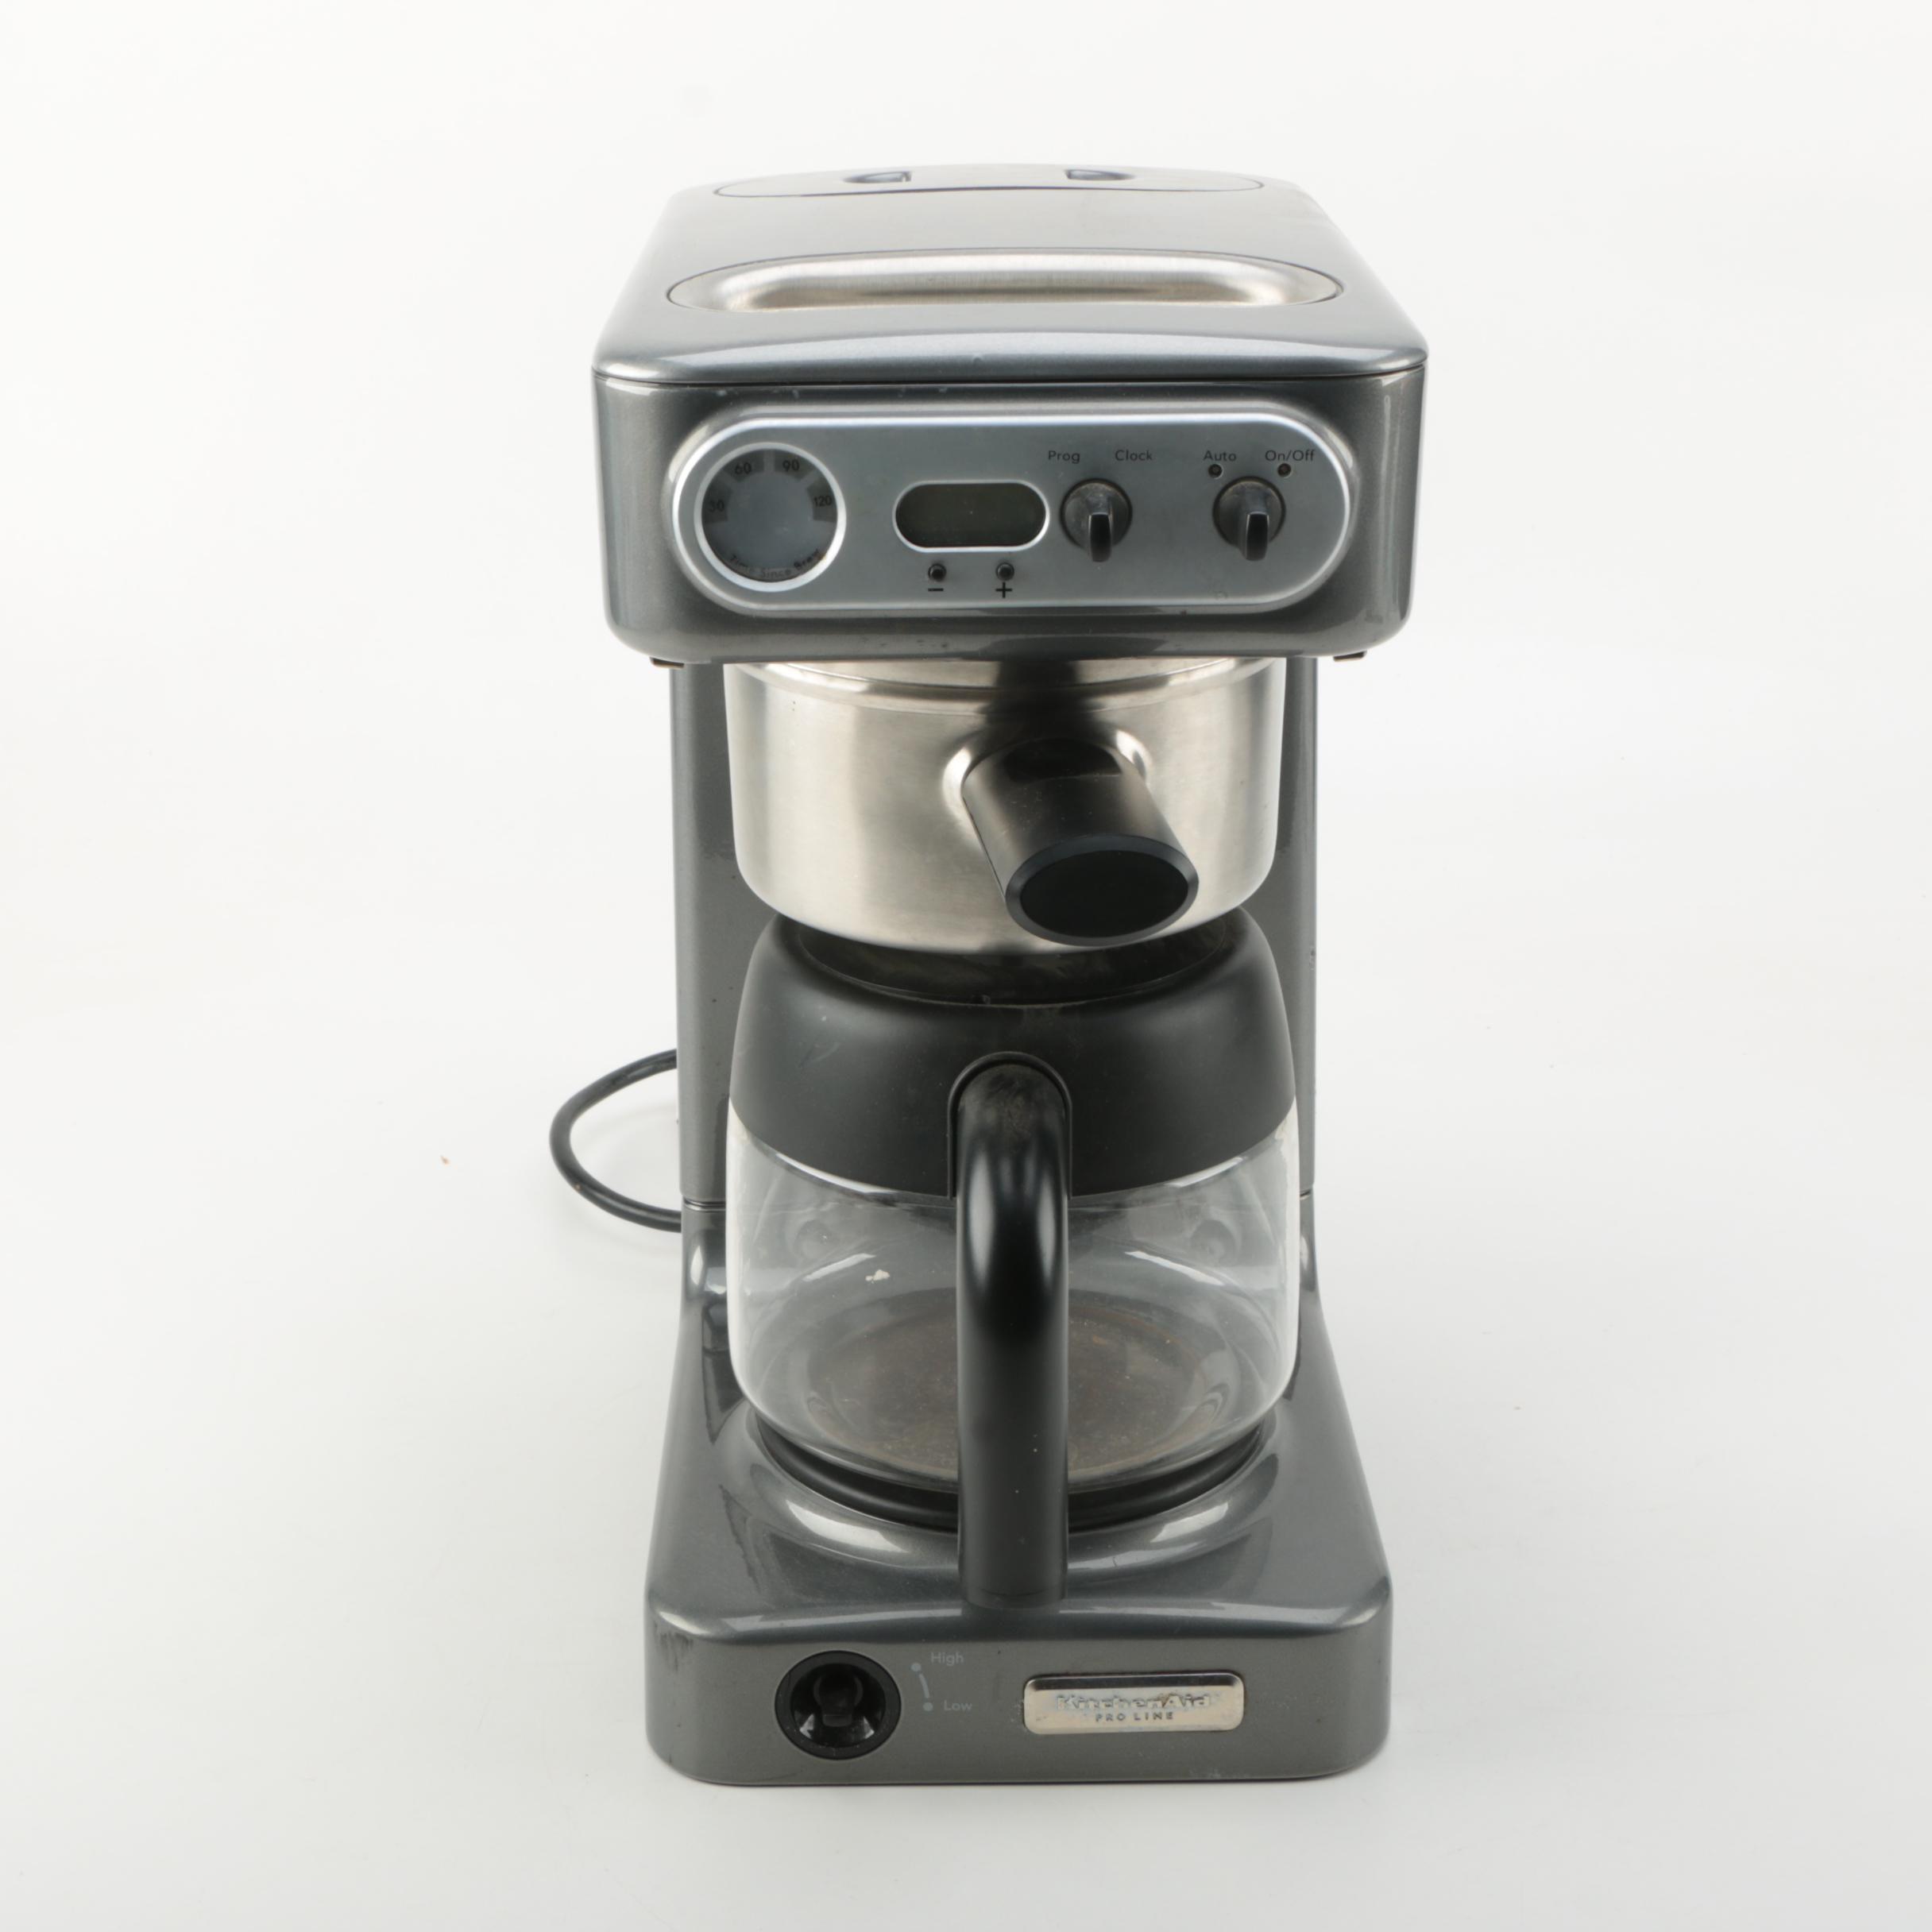 kitchen aid pro line coffee maker vintage kitchen appliances auctions   used kitchen appliances in      rh   ebth com